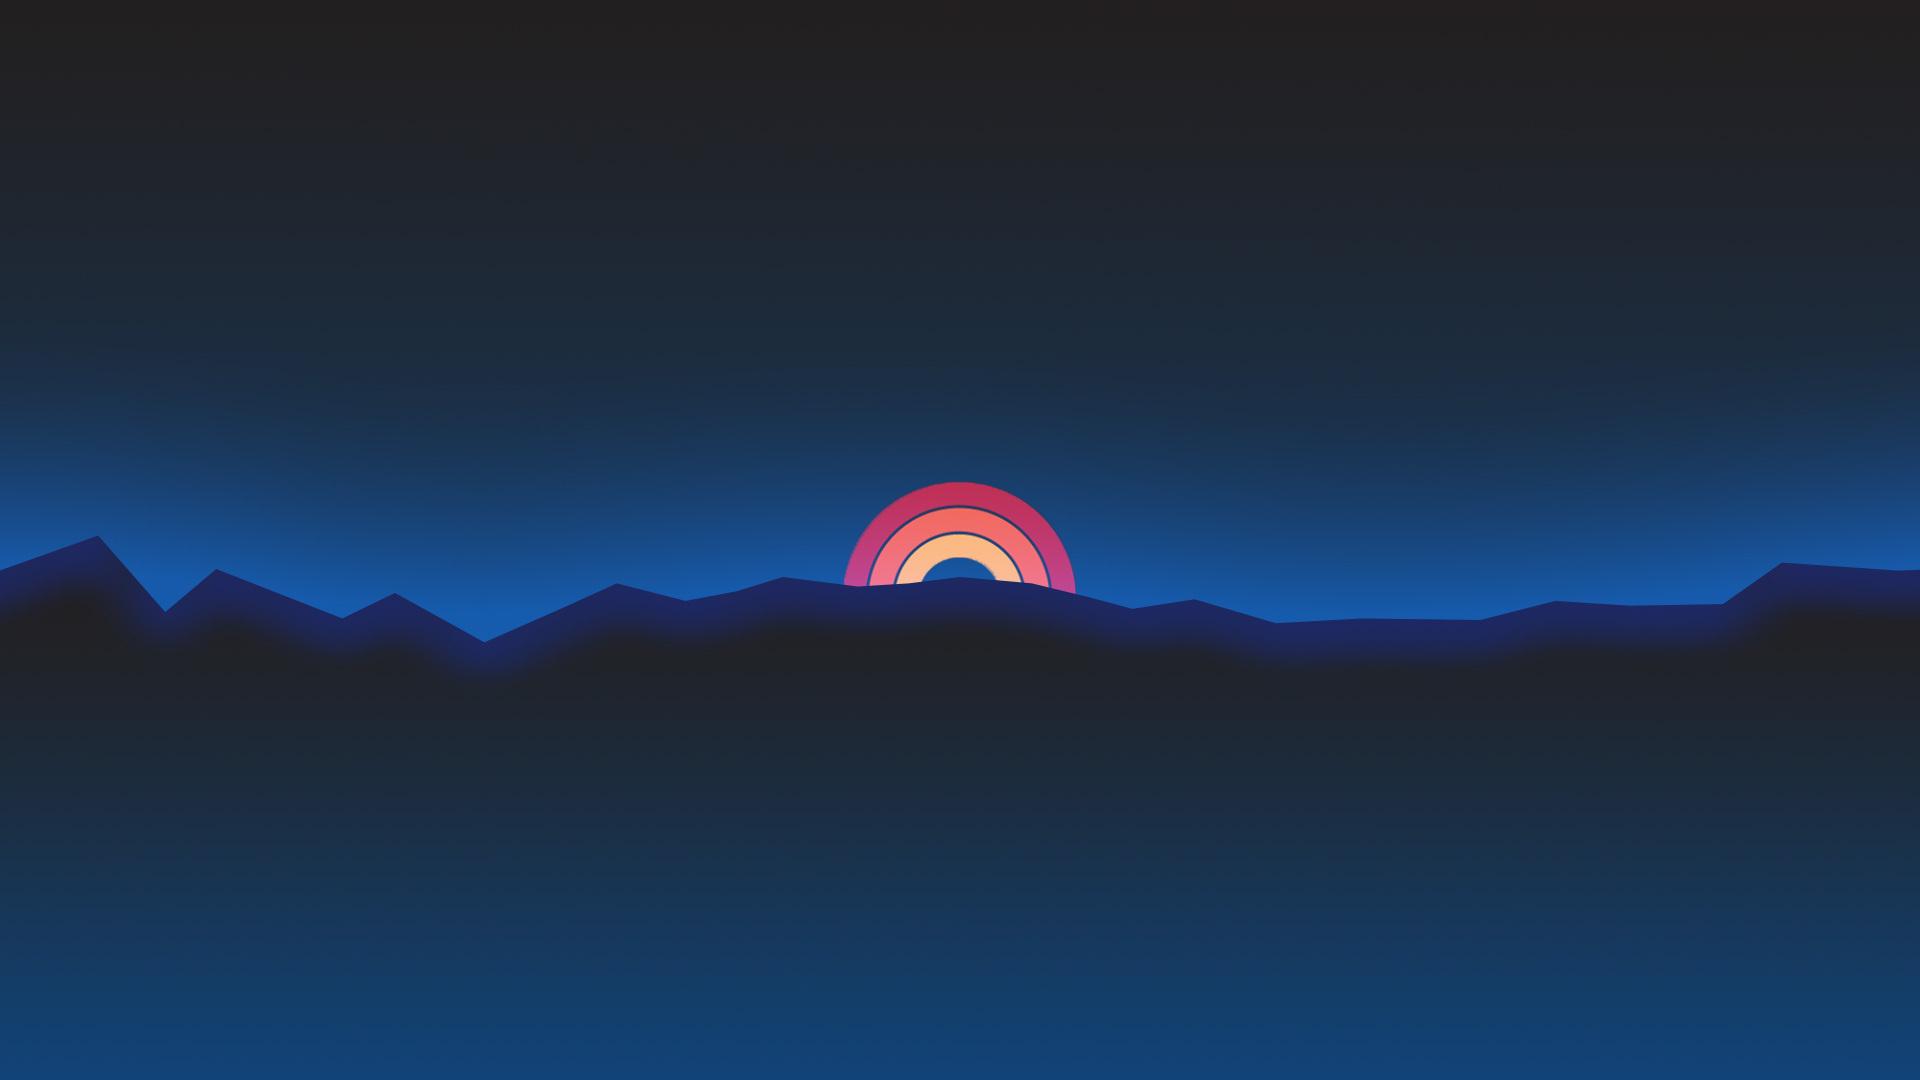 1920x1080 minimalism neon rainbow sunset retro style laptop full hd